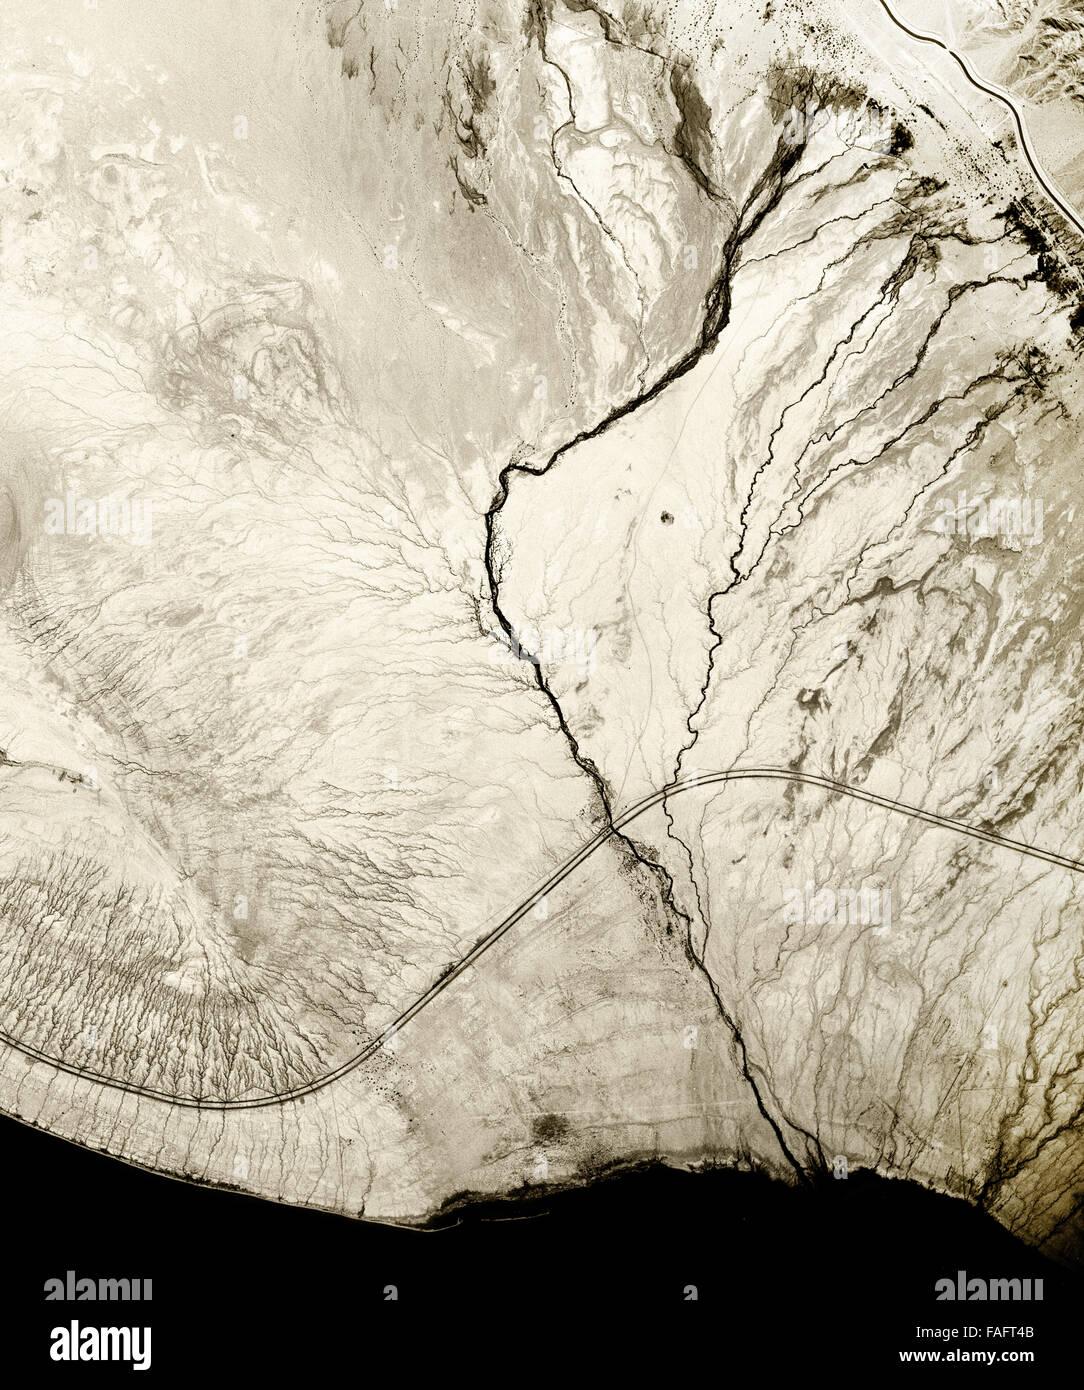 historical aerial photograph of Salton Sea, Imperial County, California, 1954 - Stock Image